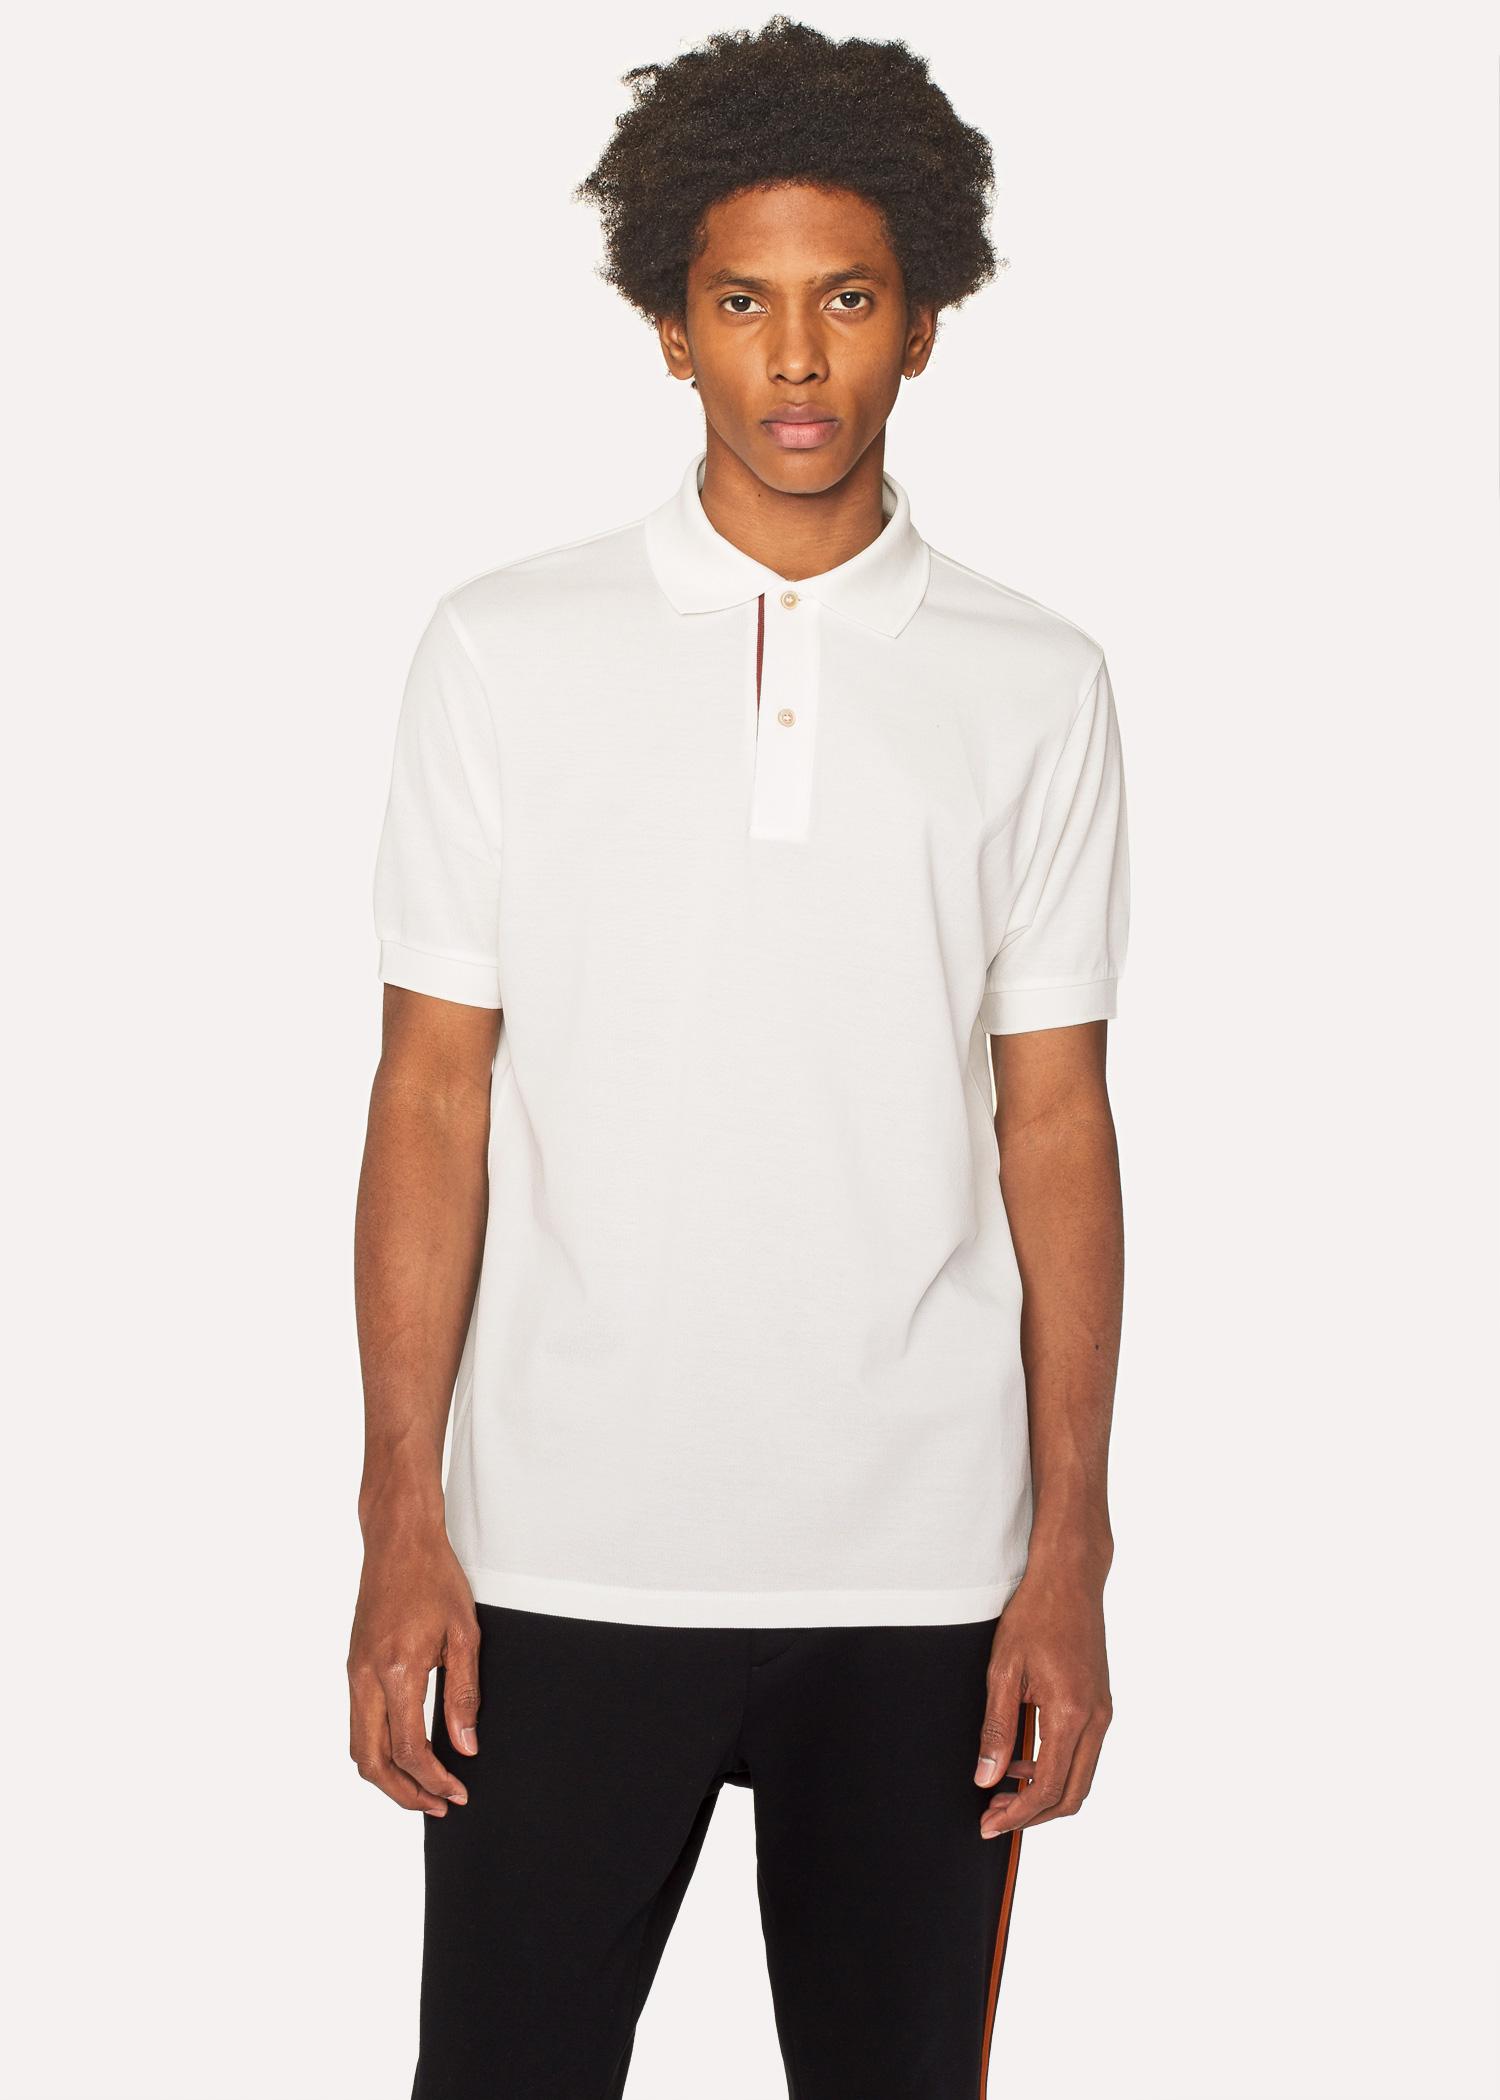 Mens Slim Fit White Cotton Piqu Polo Shirt With Artist Stripe